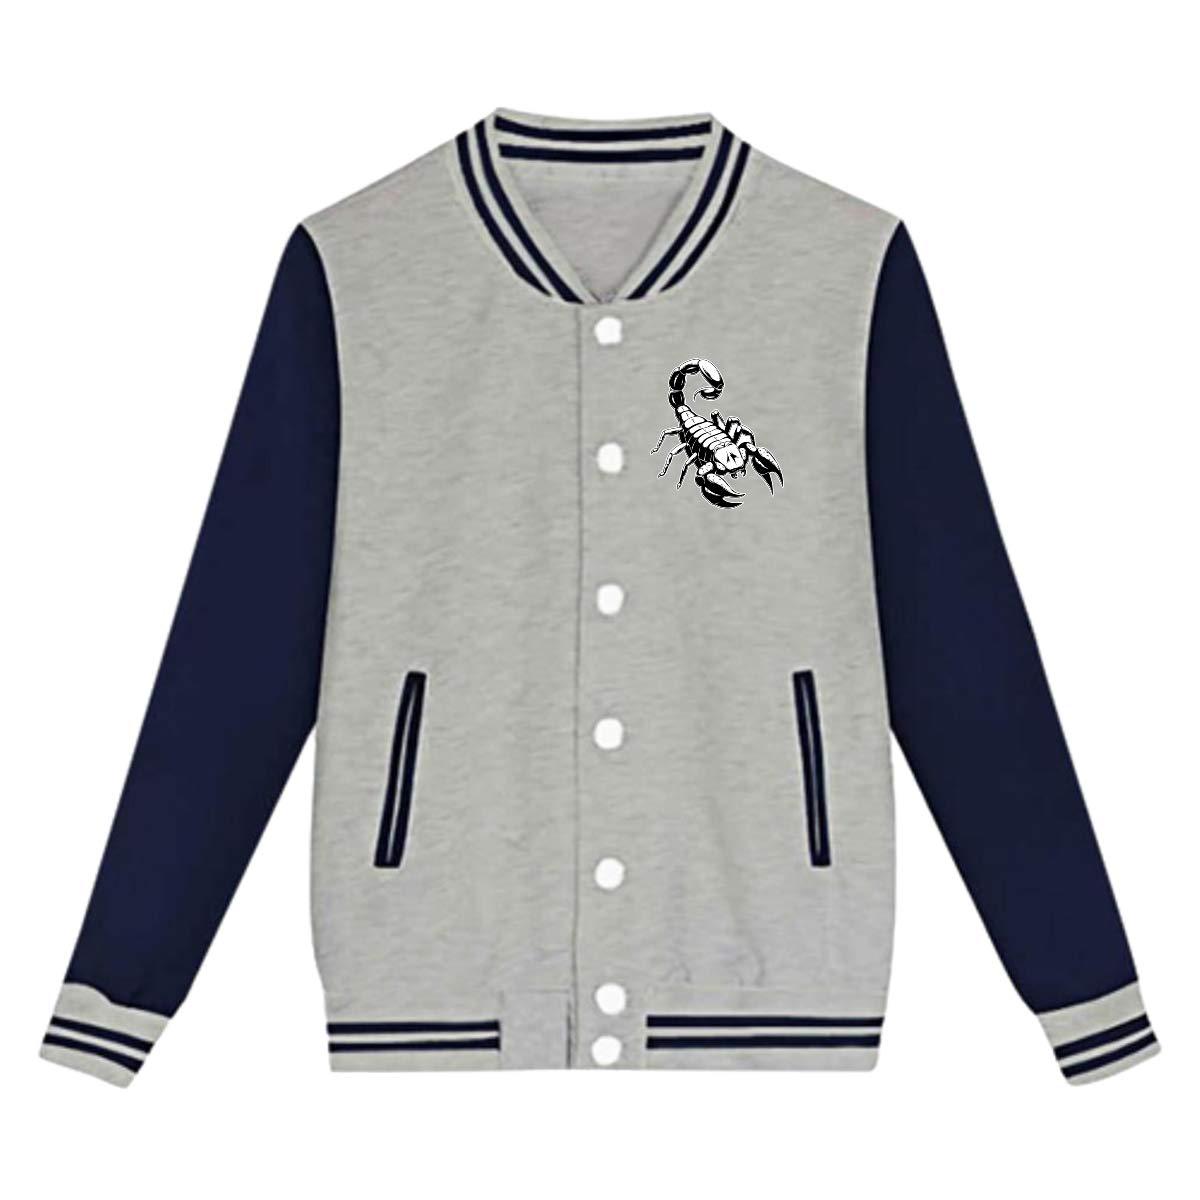 Tina TN Poison Scorpion Teens Boys Girl Varsity Baseball Jacket Long Sleeve Sport Baseball Uniform Jacket Coat Sweater Black